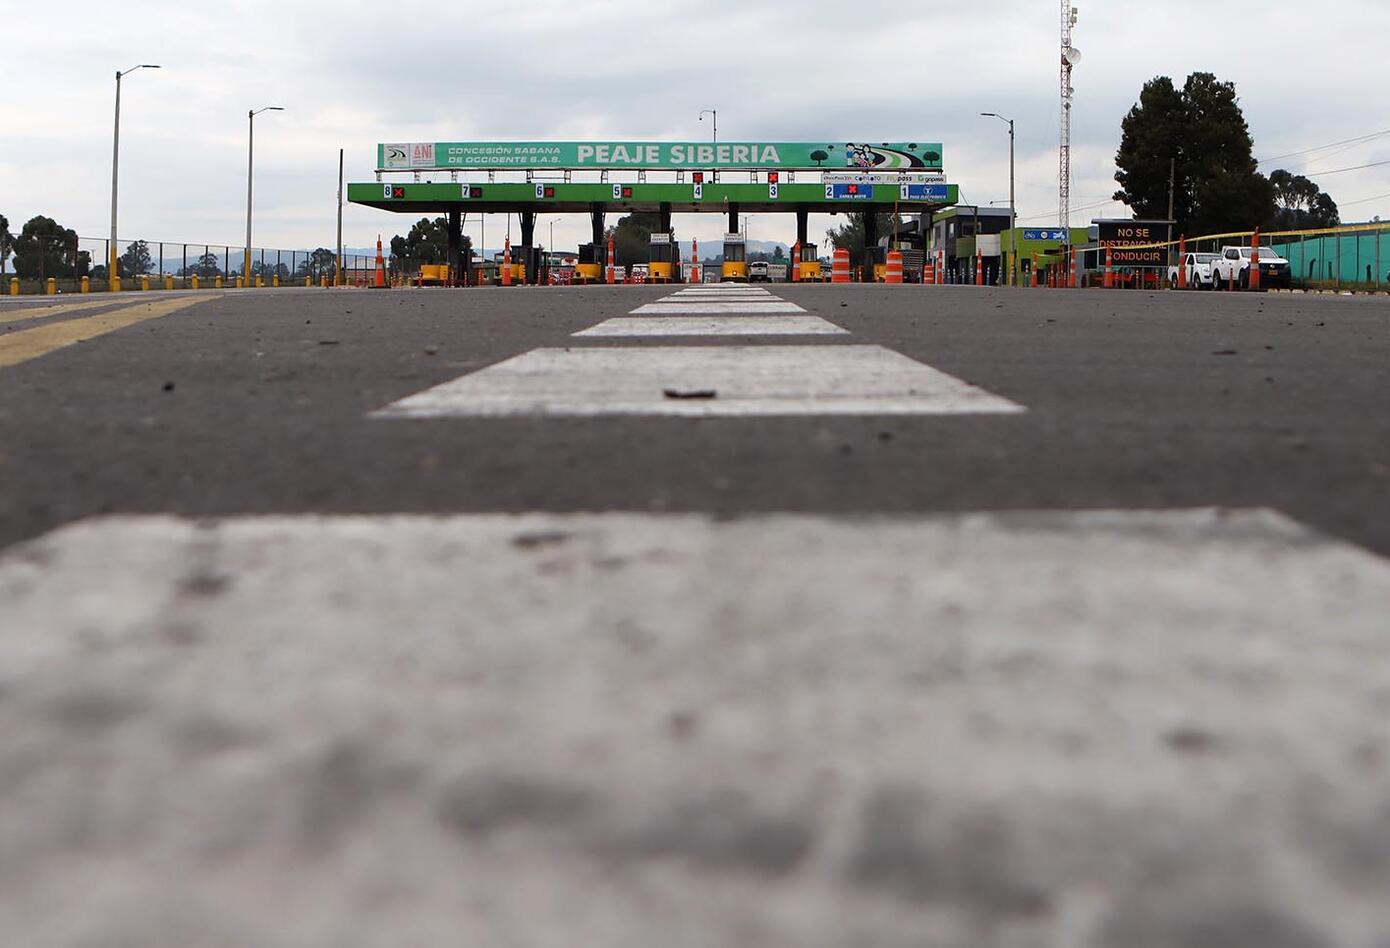 Carretera en peaje de la calle 80 - Bogotá